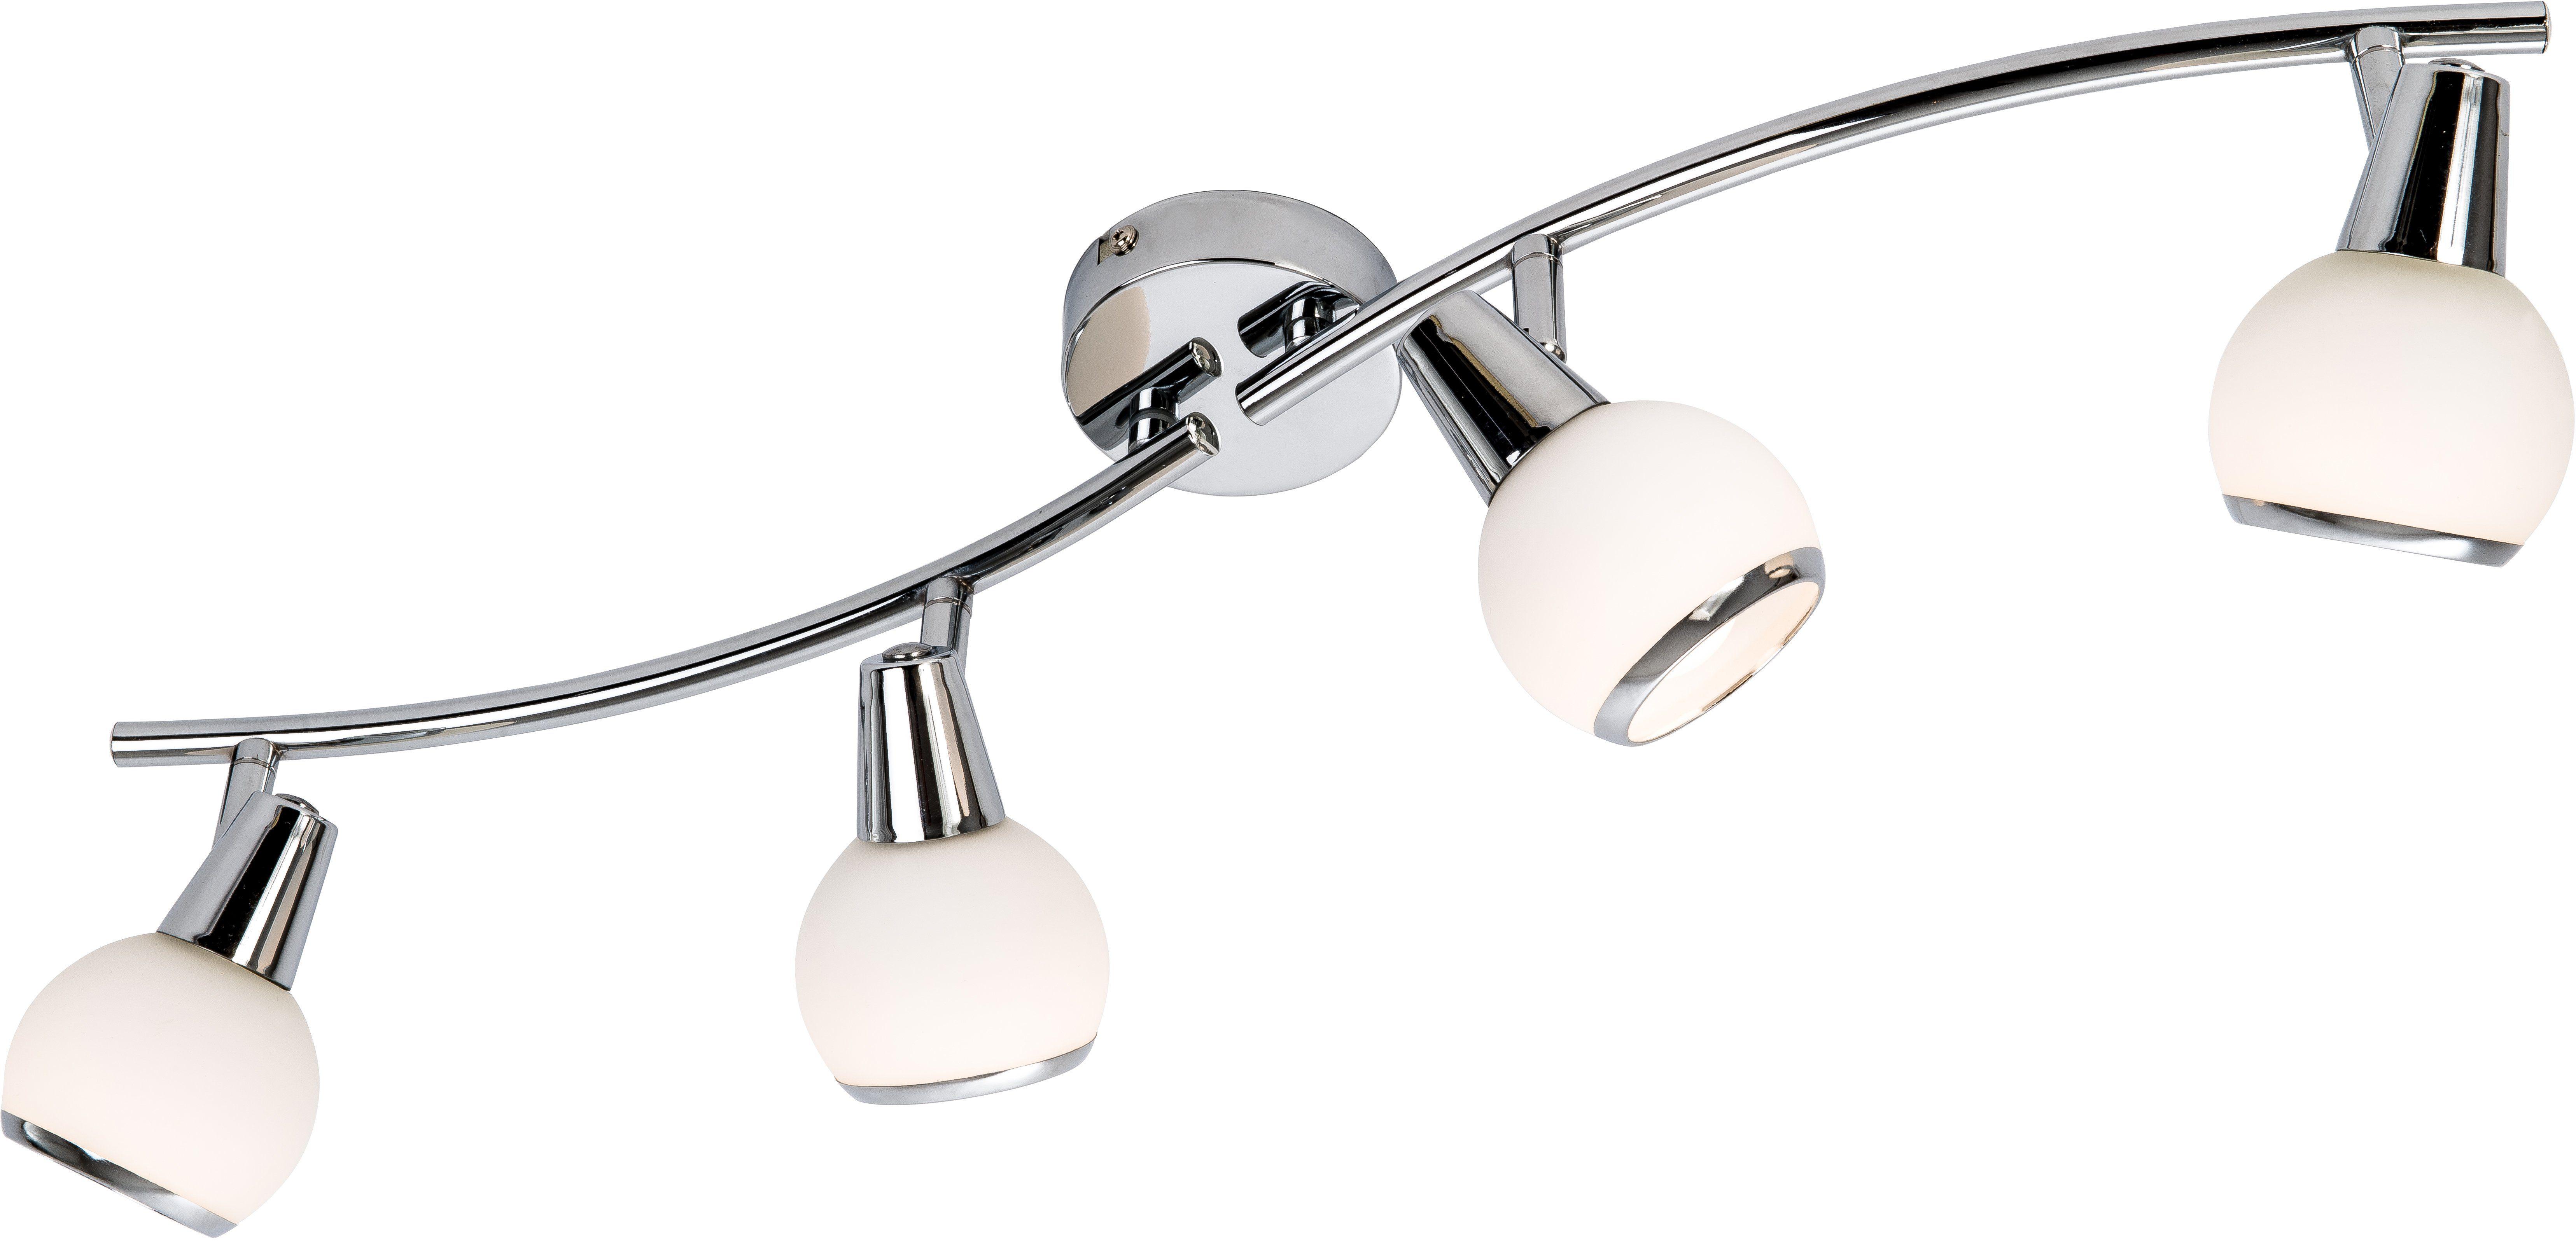 Nino LED-Deckenleuchte, 4flg., »LORIS«